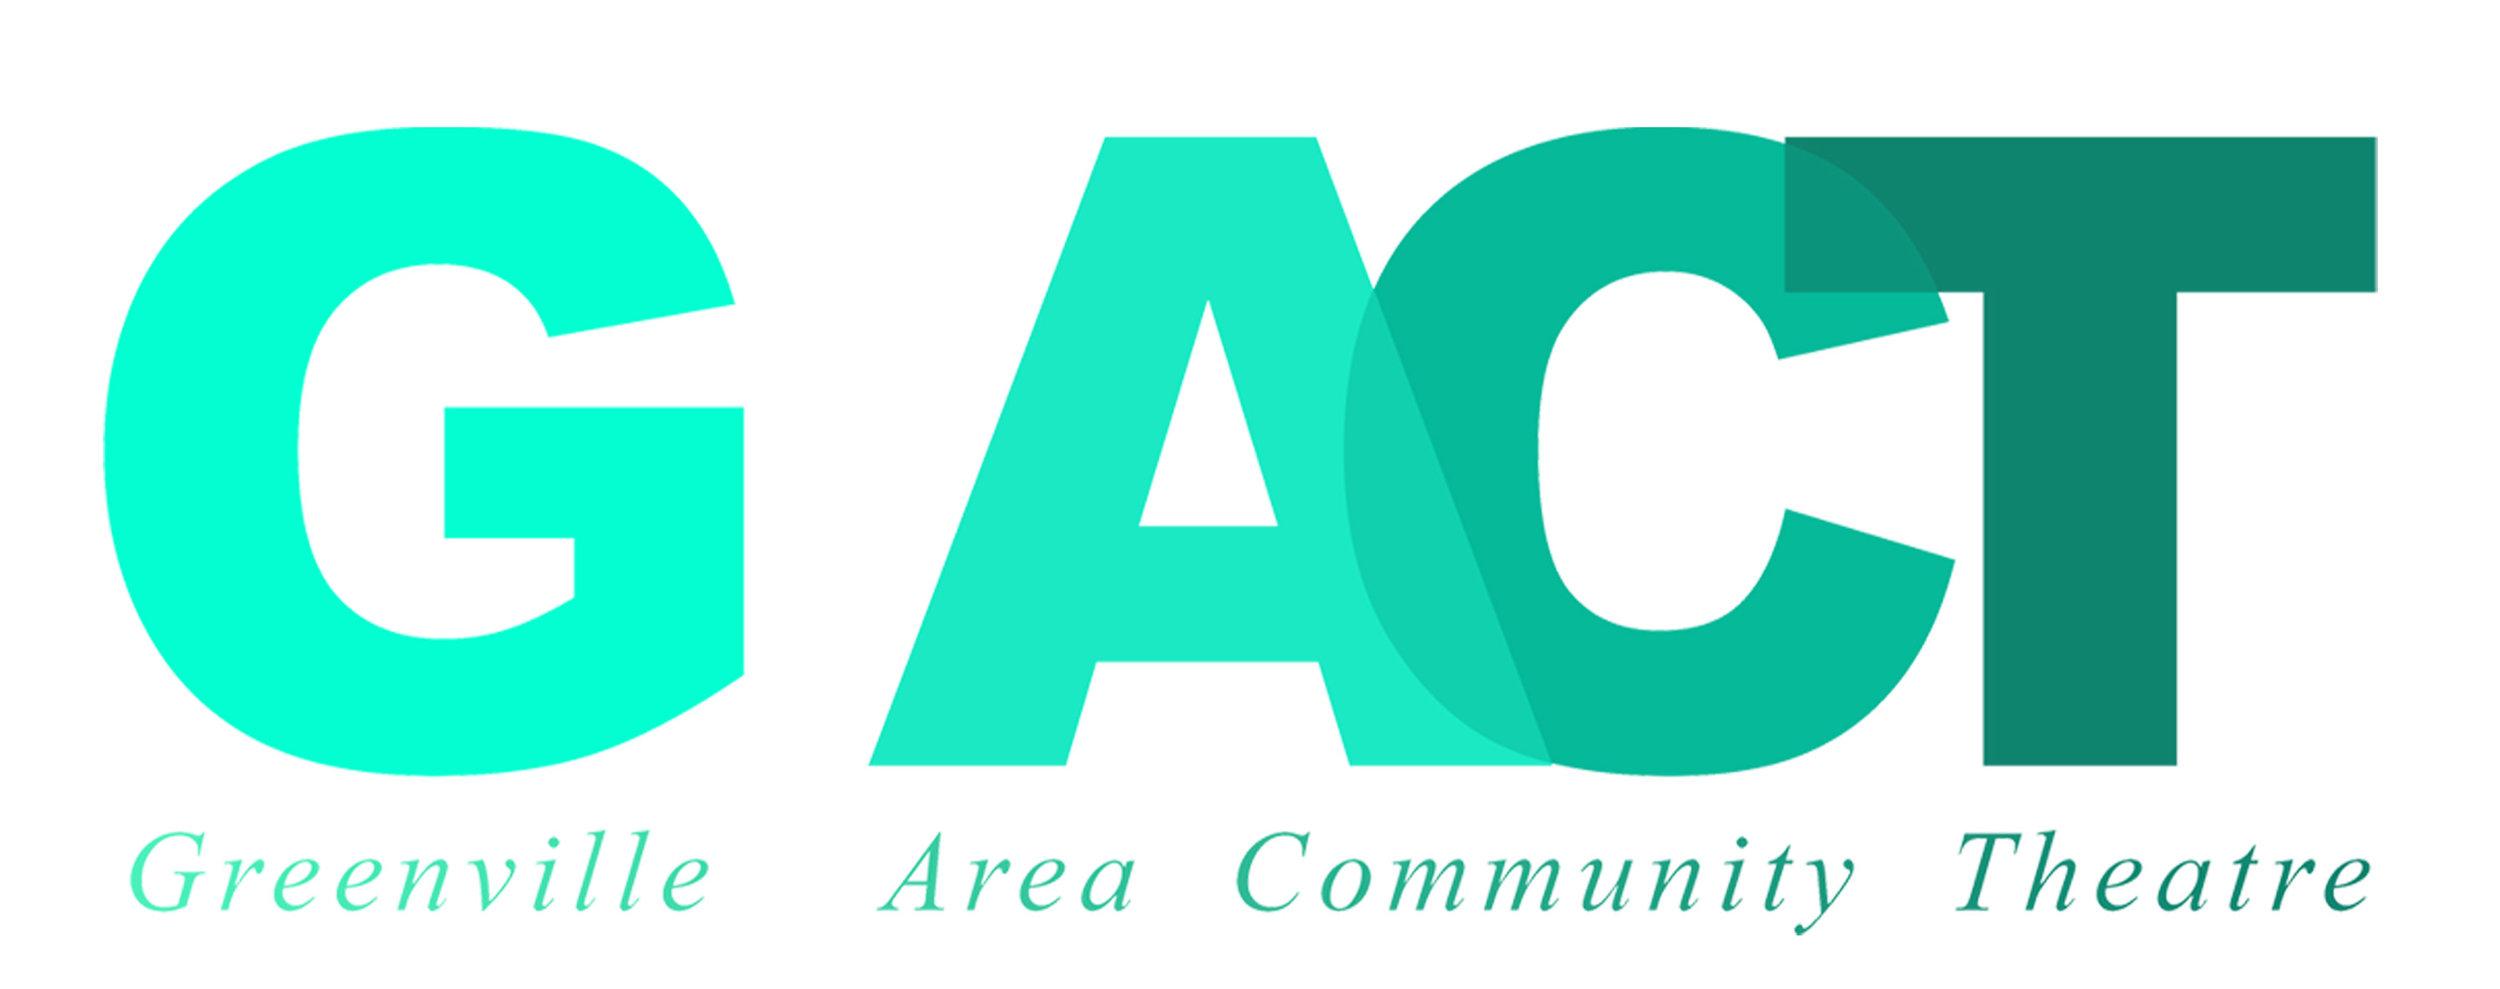 logo rasterized.jpg